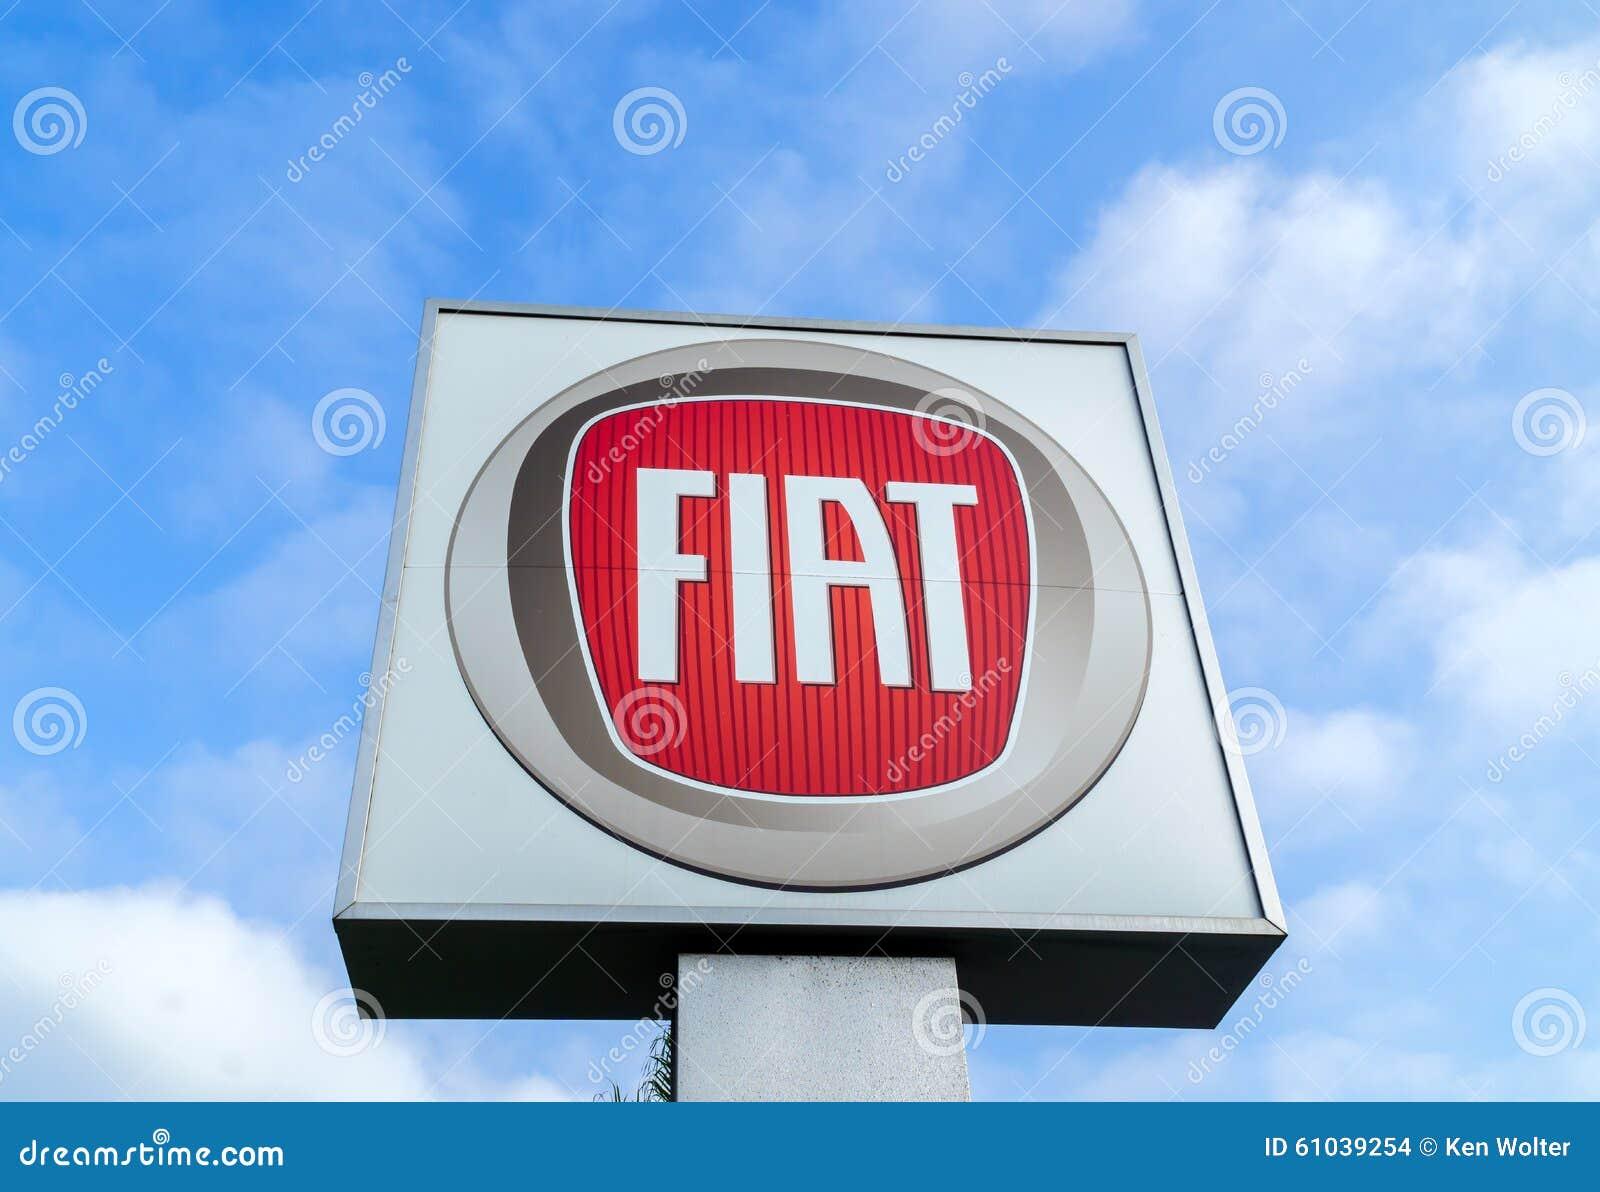 fiat dealership sign editorial stock image image of italy 61039254. Black Bedroom Furniture Sets. Home Design Ideas